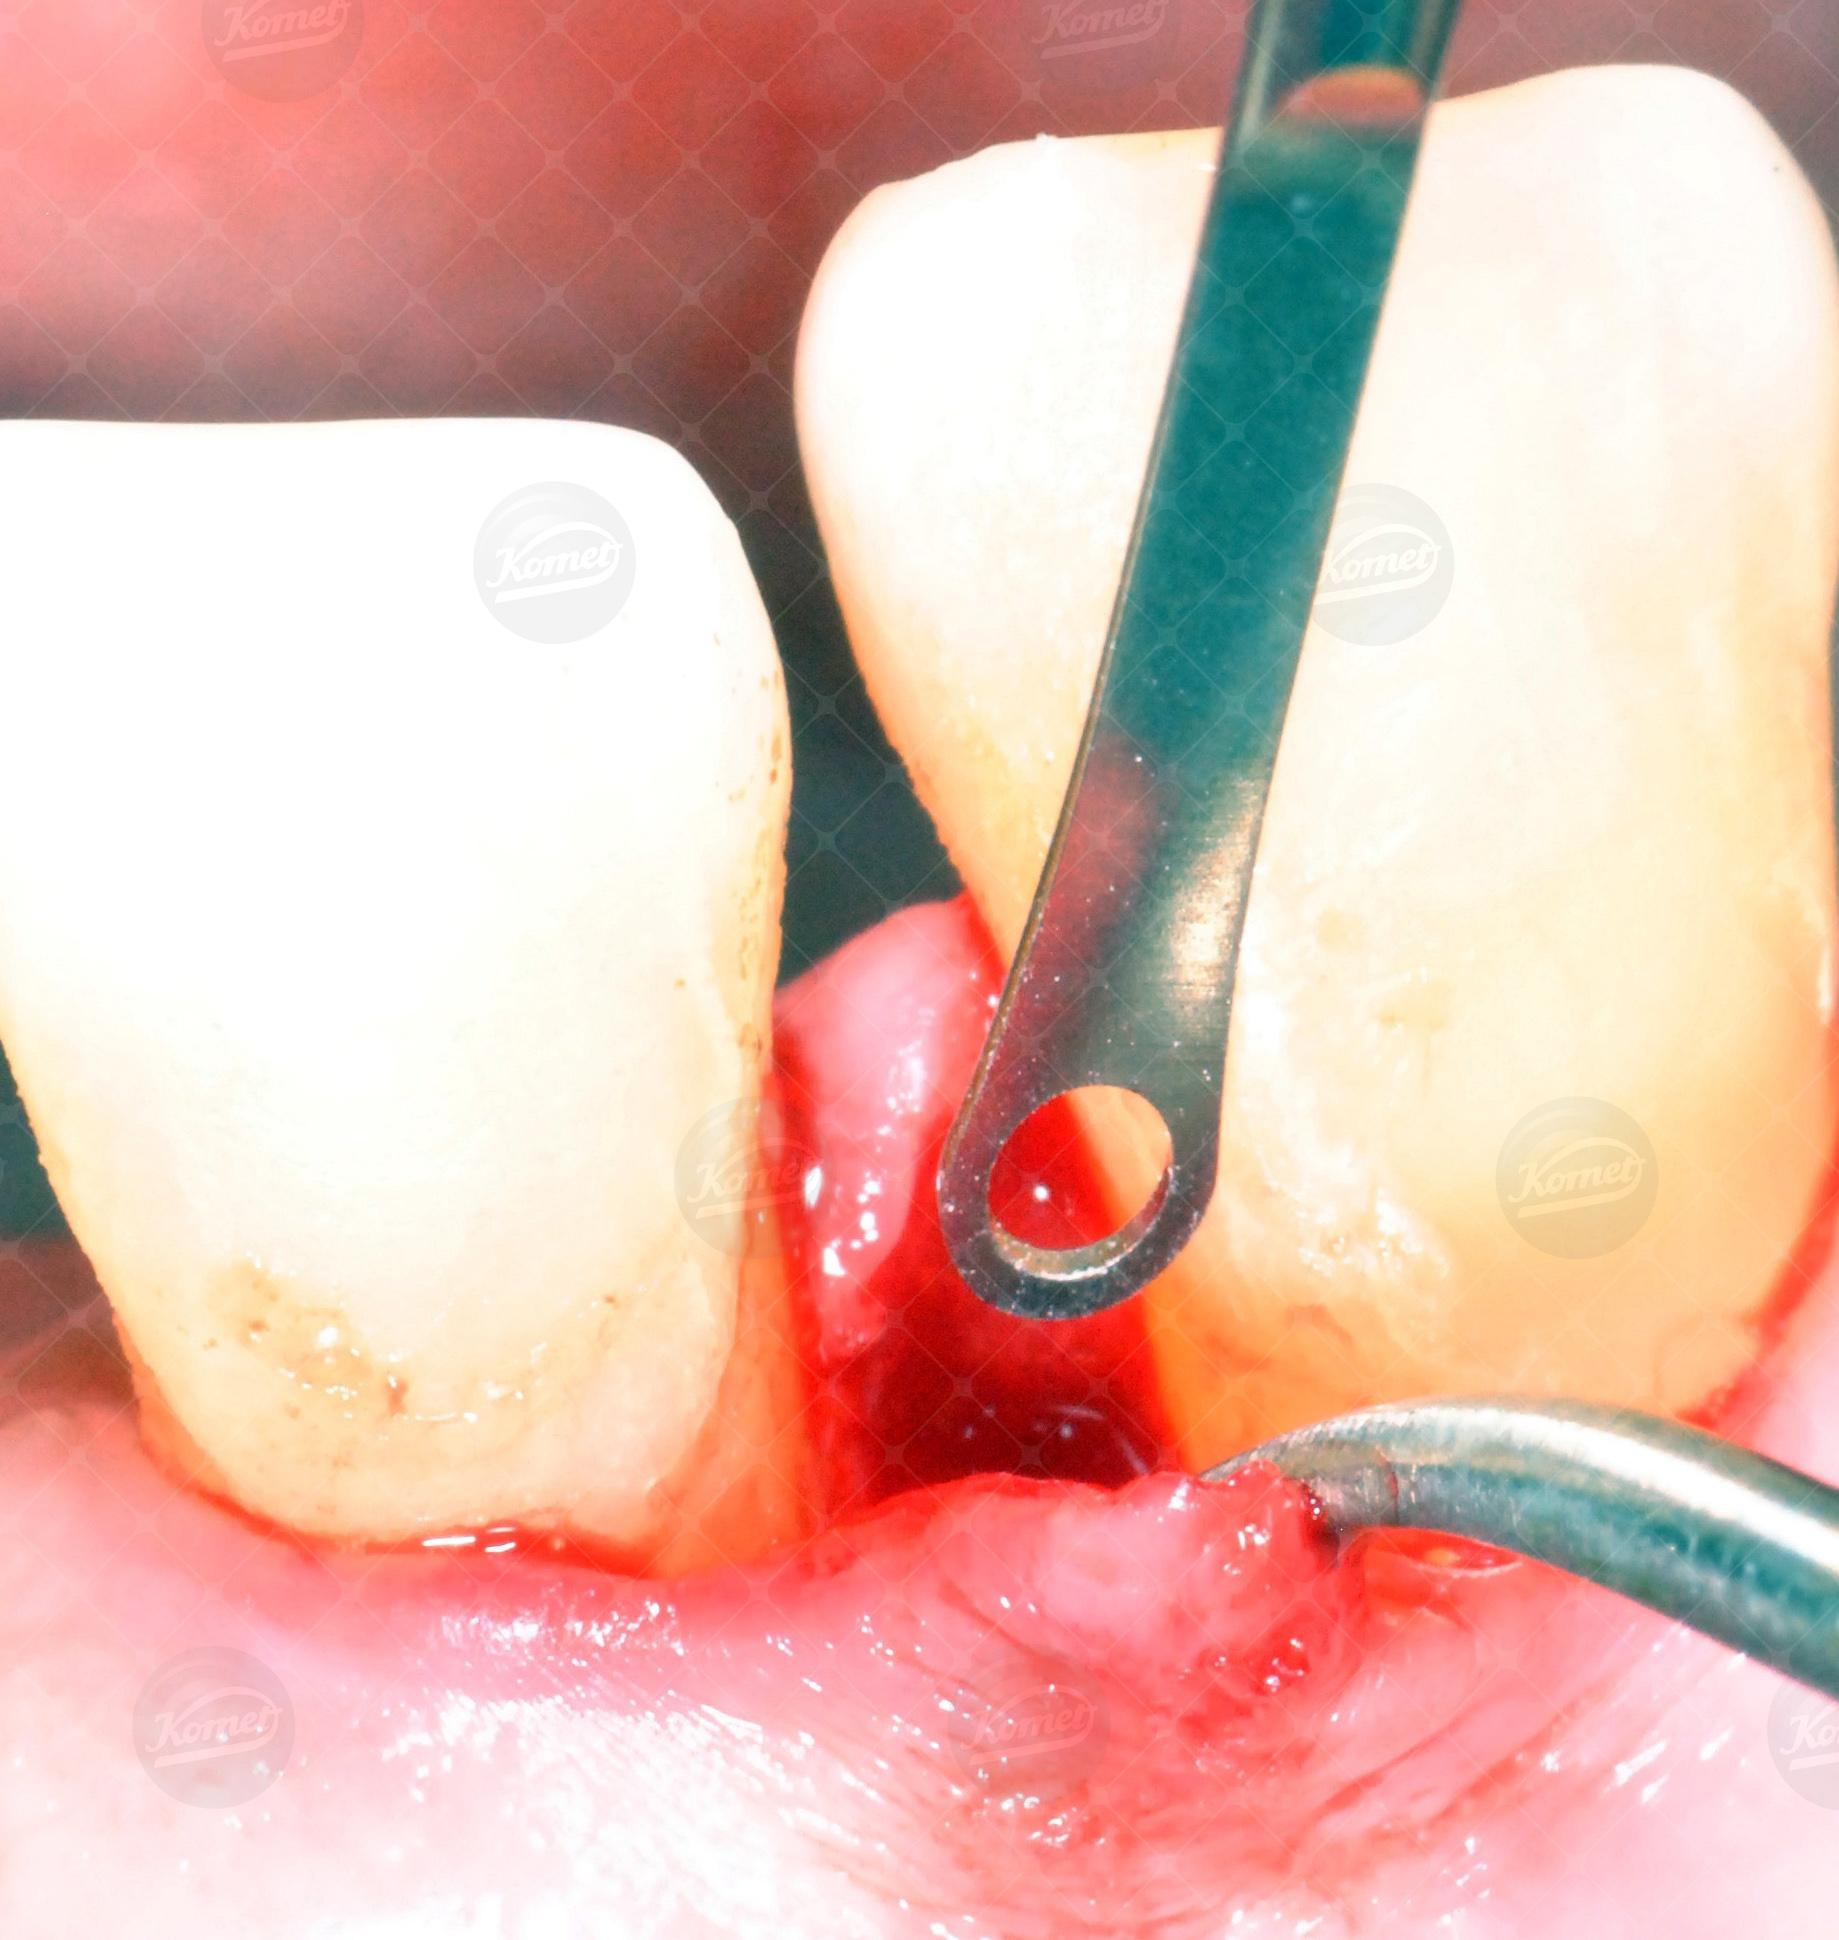 Immagini cliniche Dr Salvatore Batia (11)